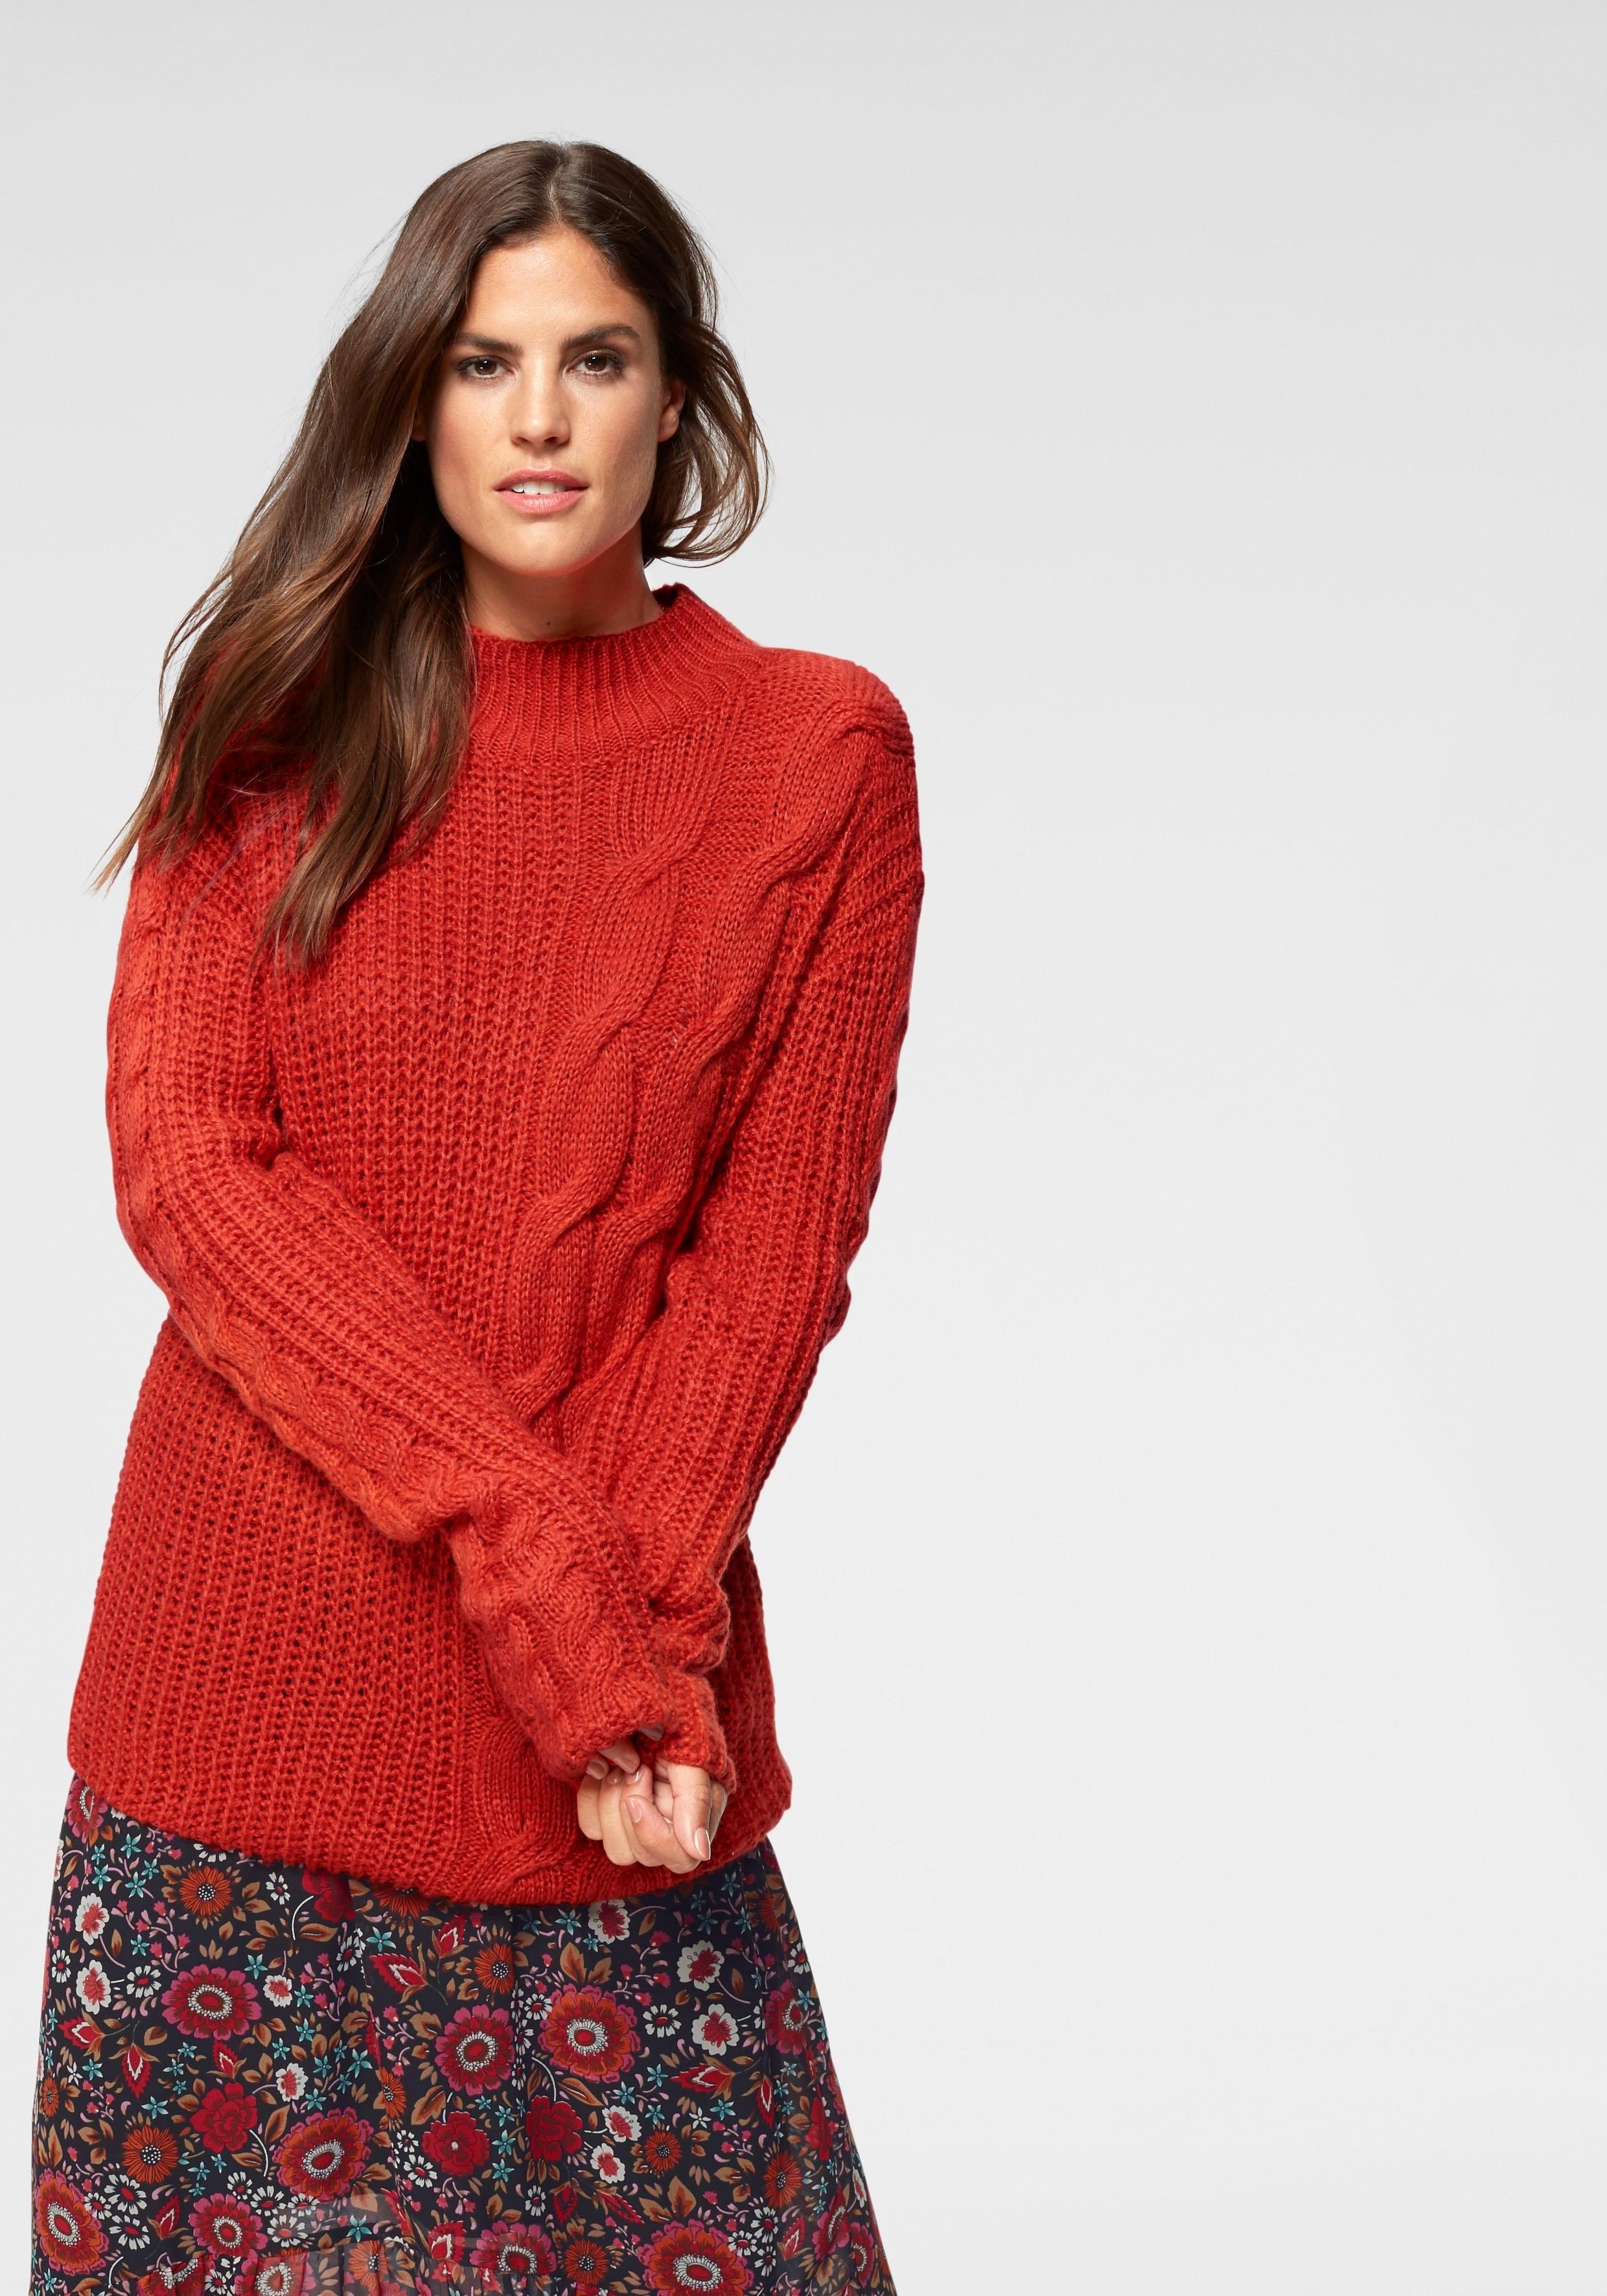 Aniston By Baur Aniston trui met staande kraag online kopen op otto.nl